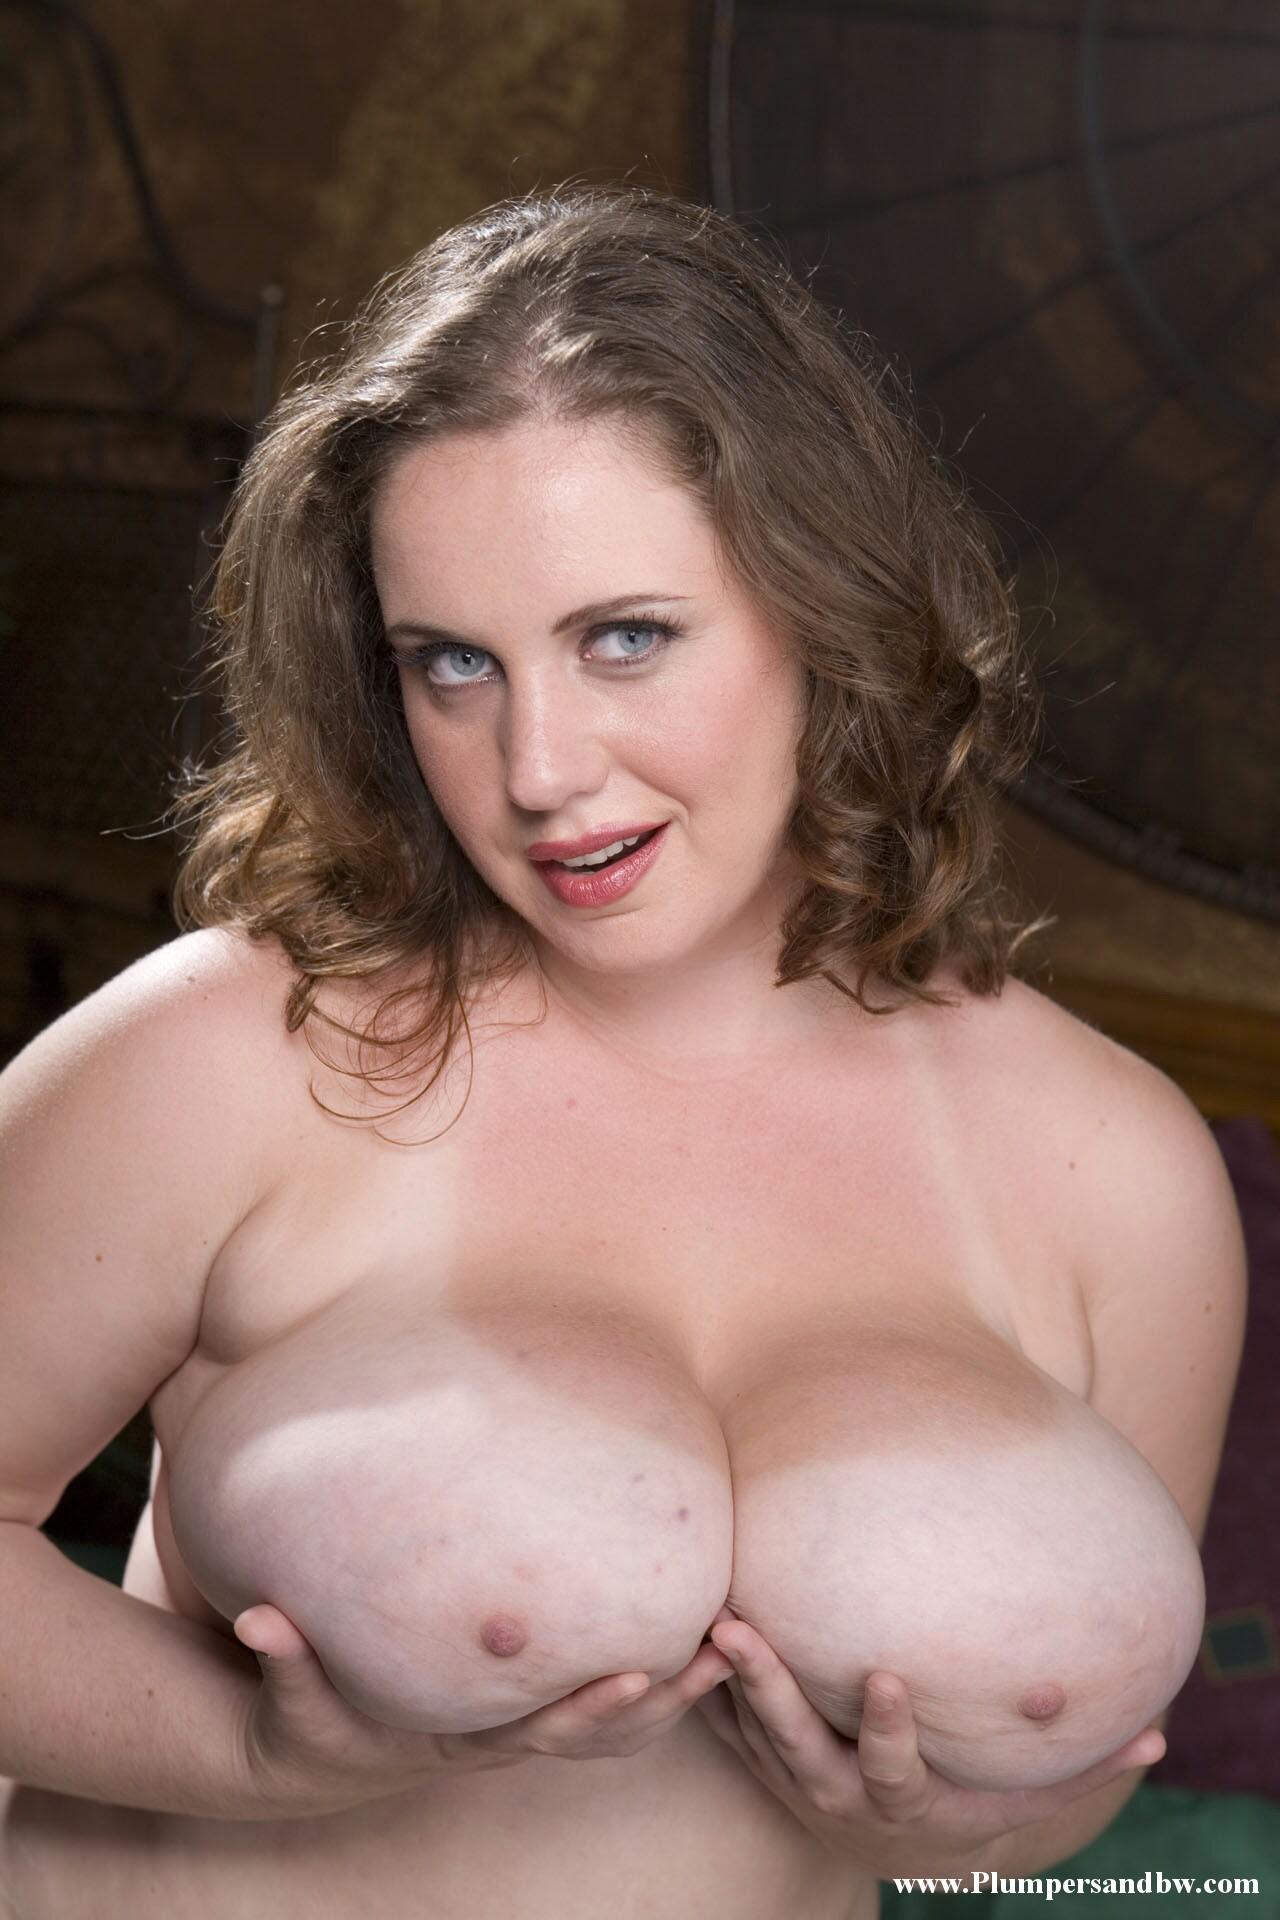 beauty chubby girls nude